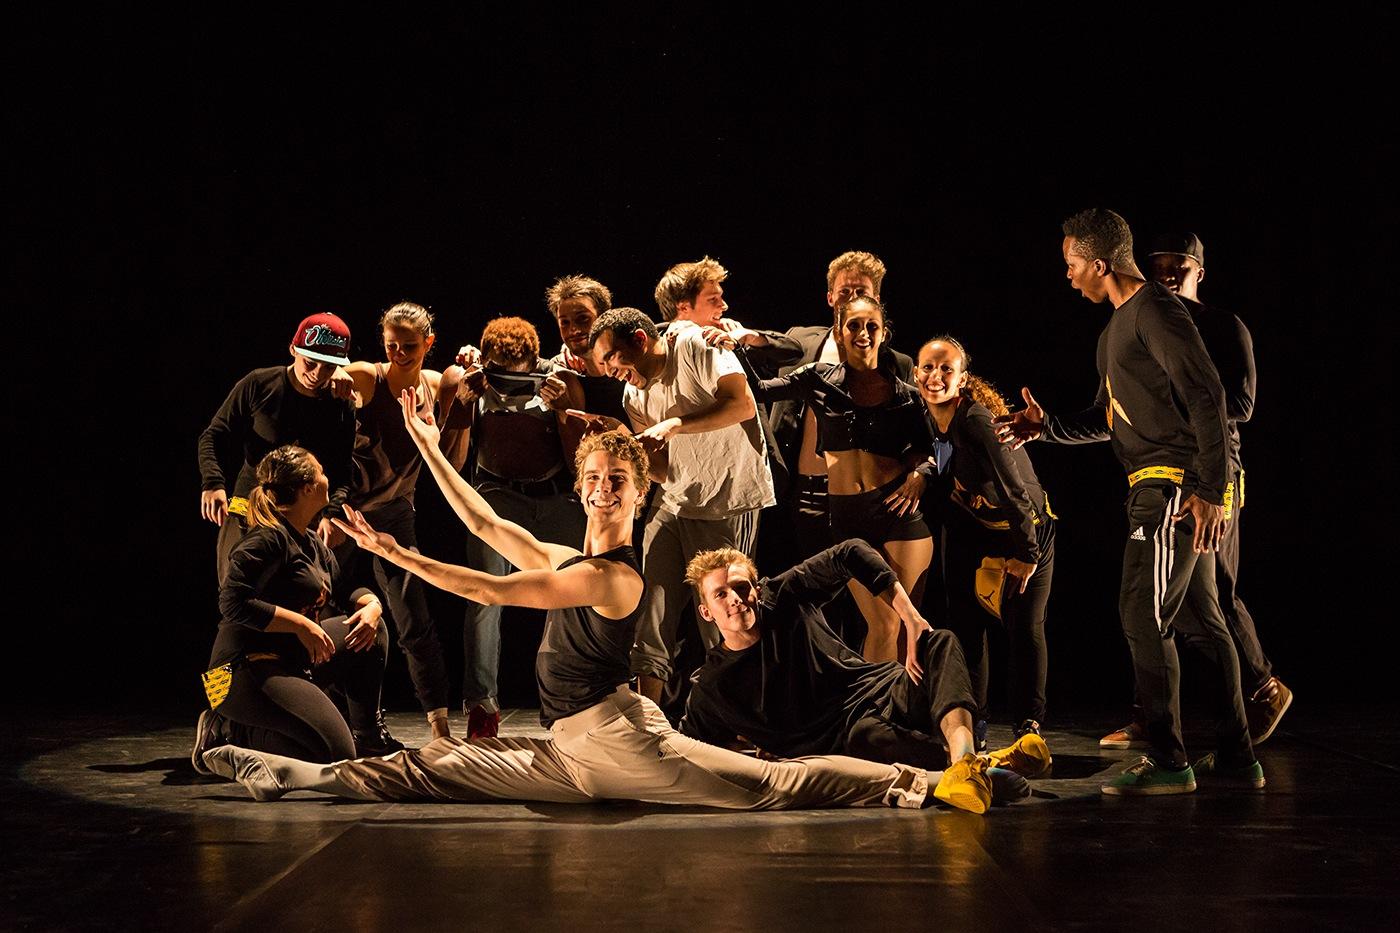 photographe-reportage-danse-avec-ton-crous-guillaume-heraud-044-small